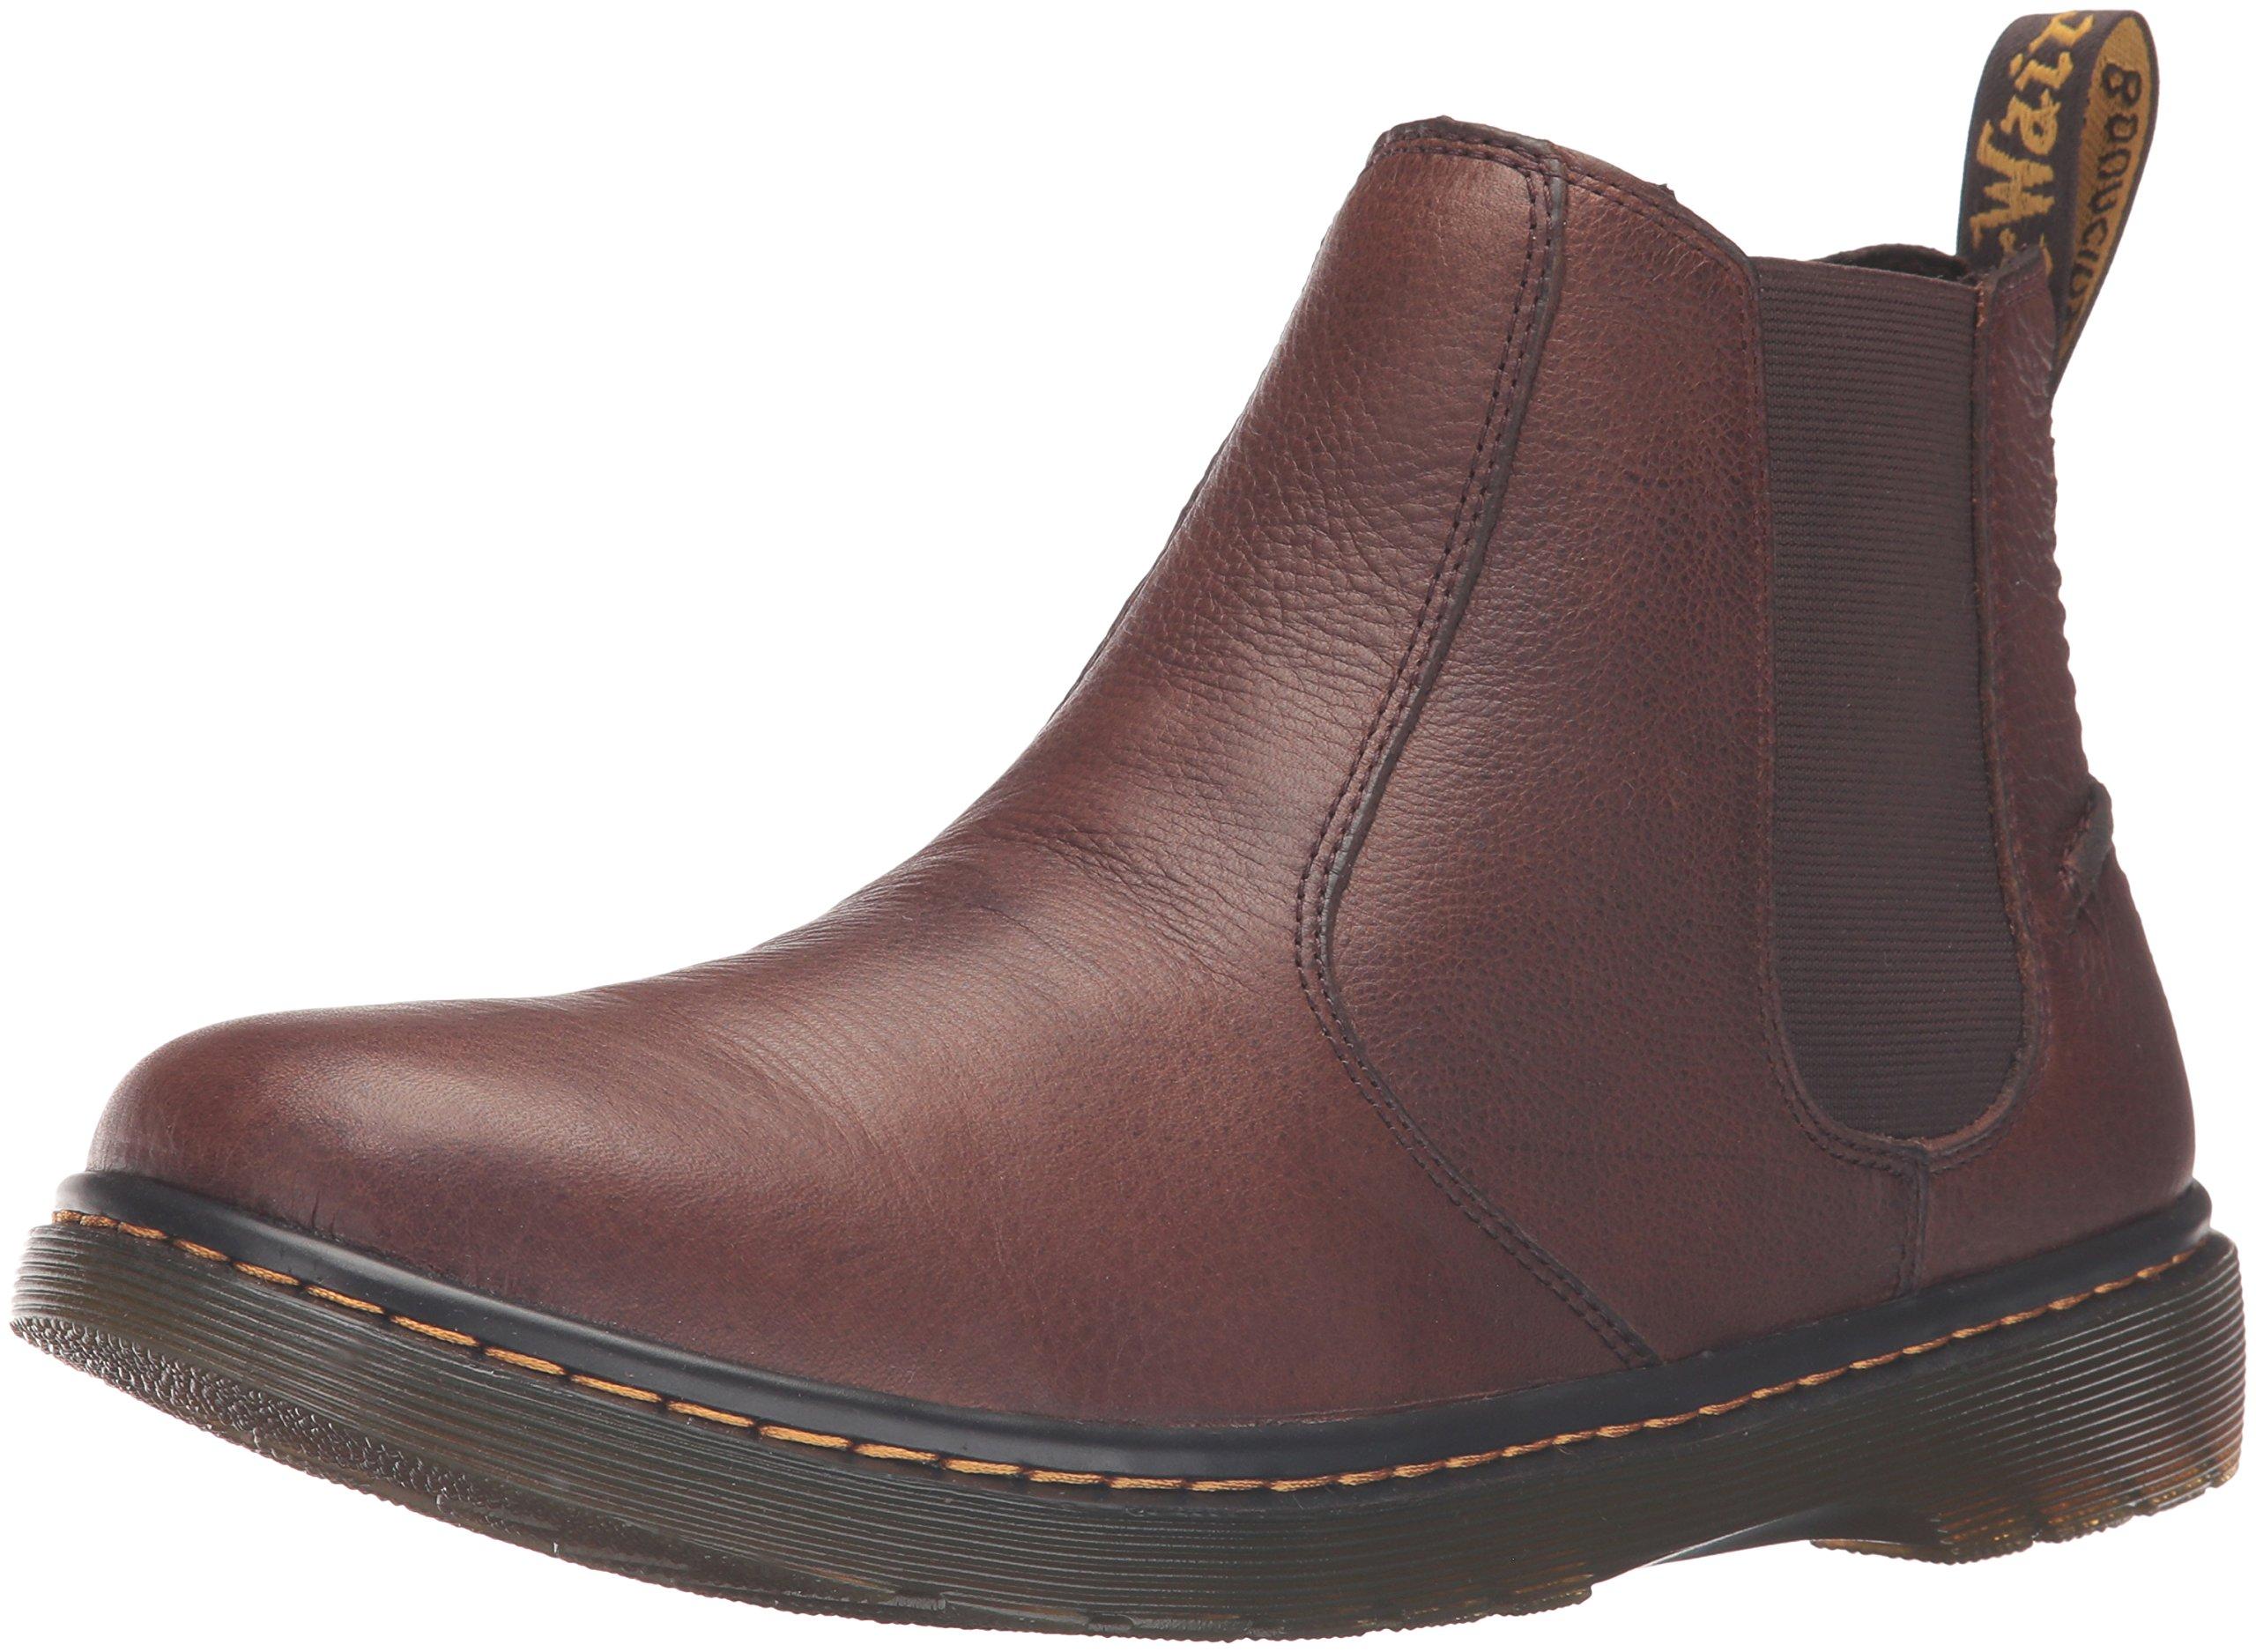 Dr. Martens Men's Lyme Chelsea Boot, Dark Brown, 6 UK/7 M US